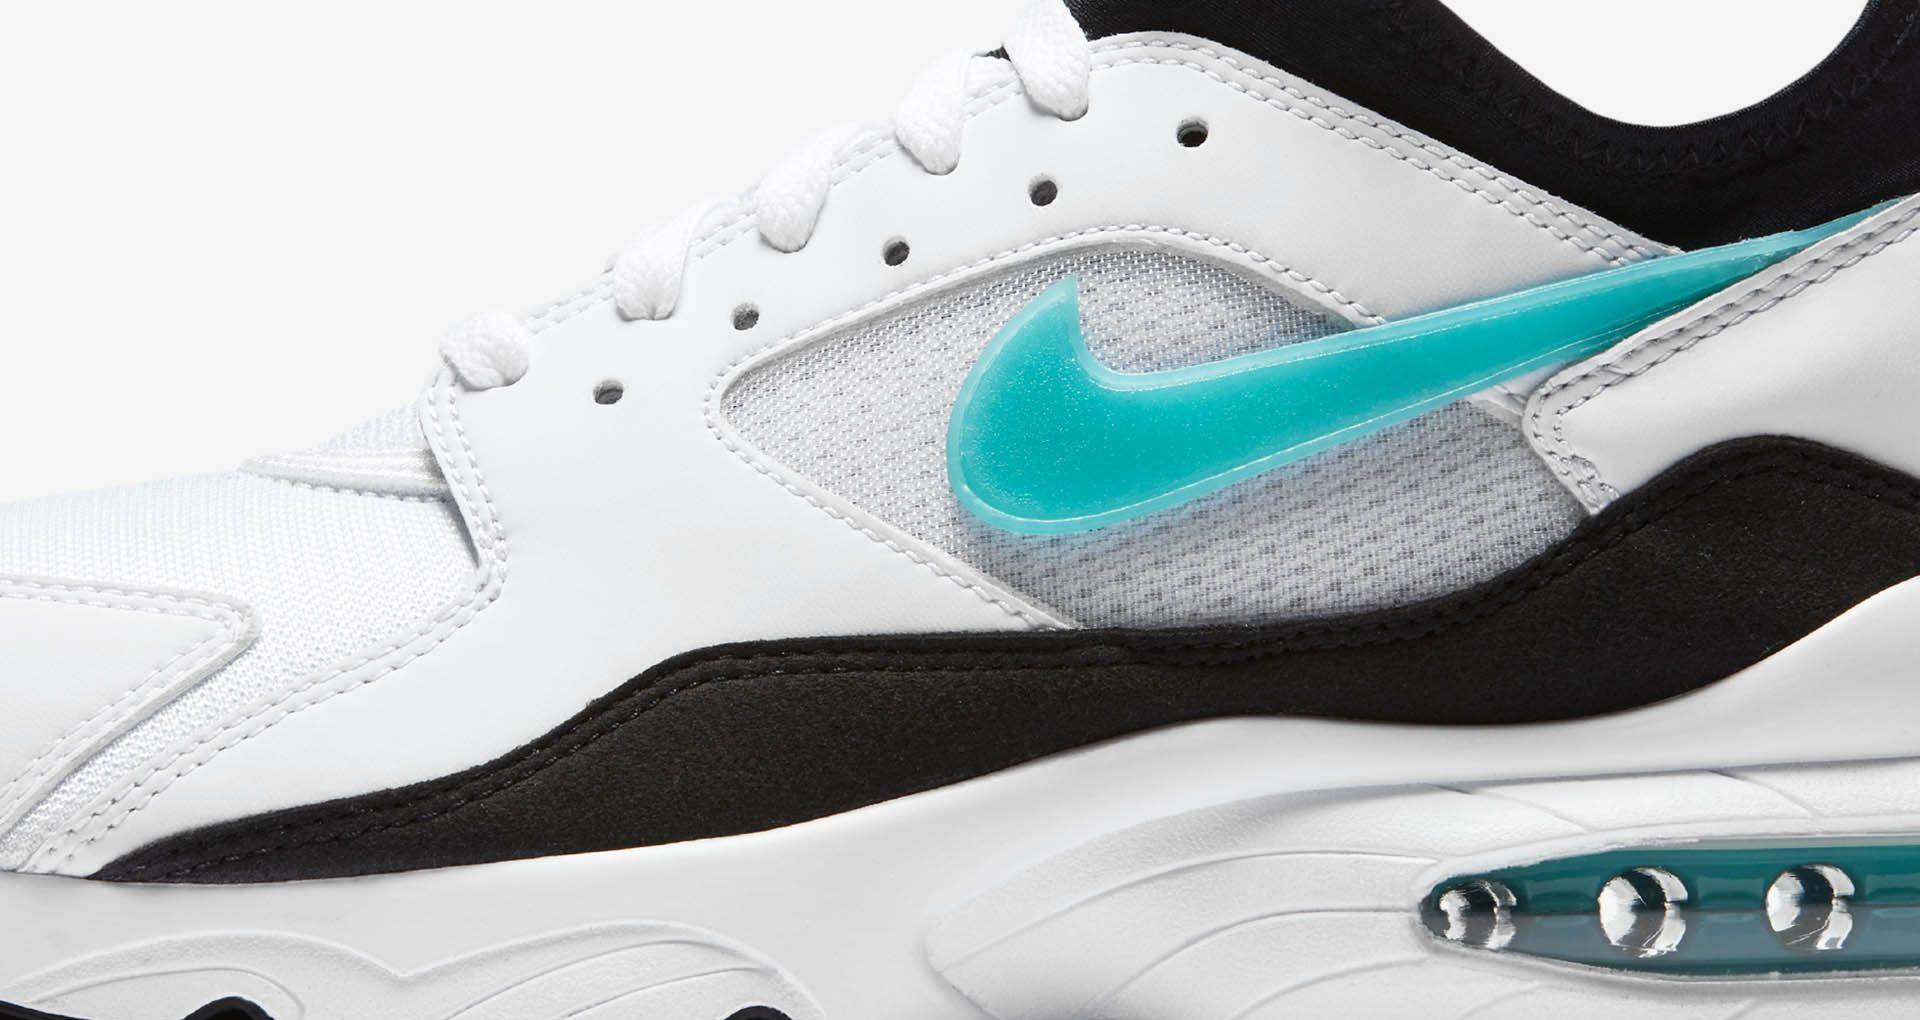 Date de sortie de la Nike Air Max « White & Sport